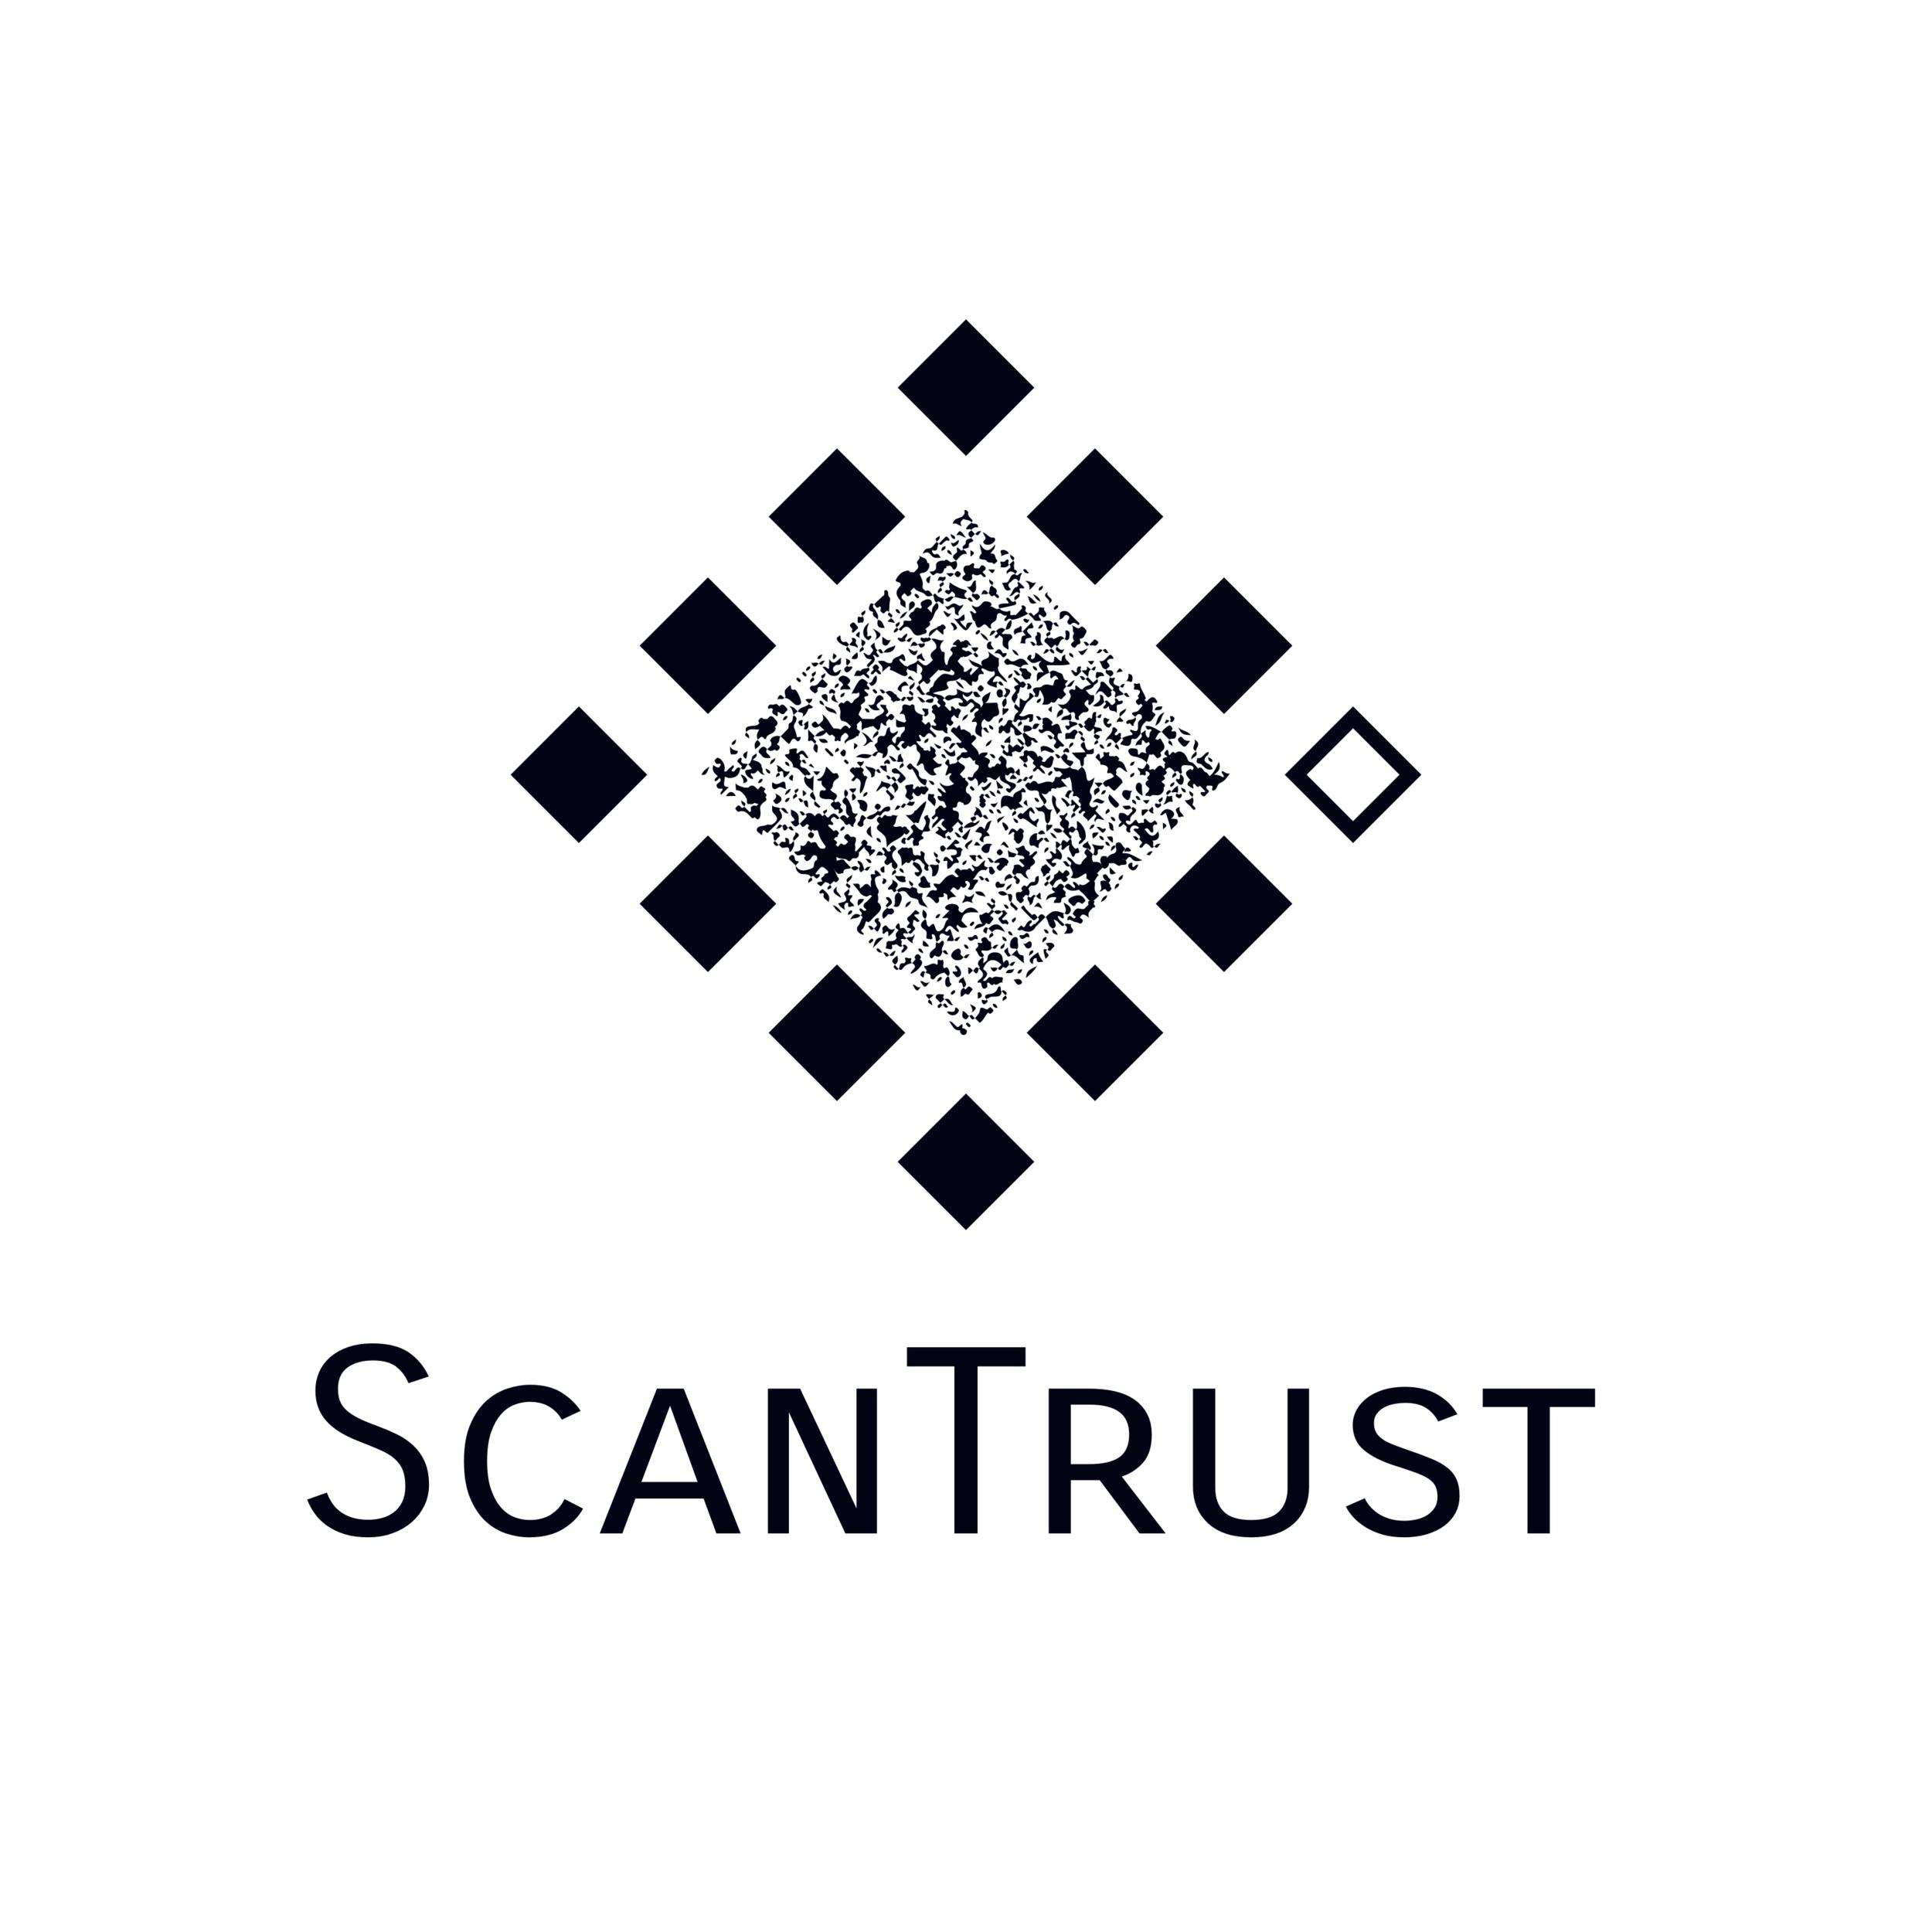 ST logo square black on white.png